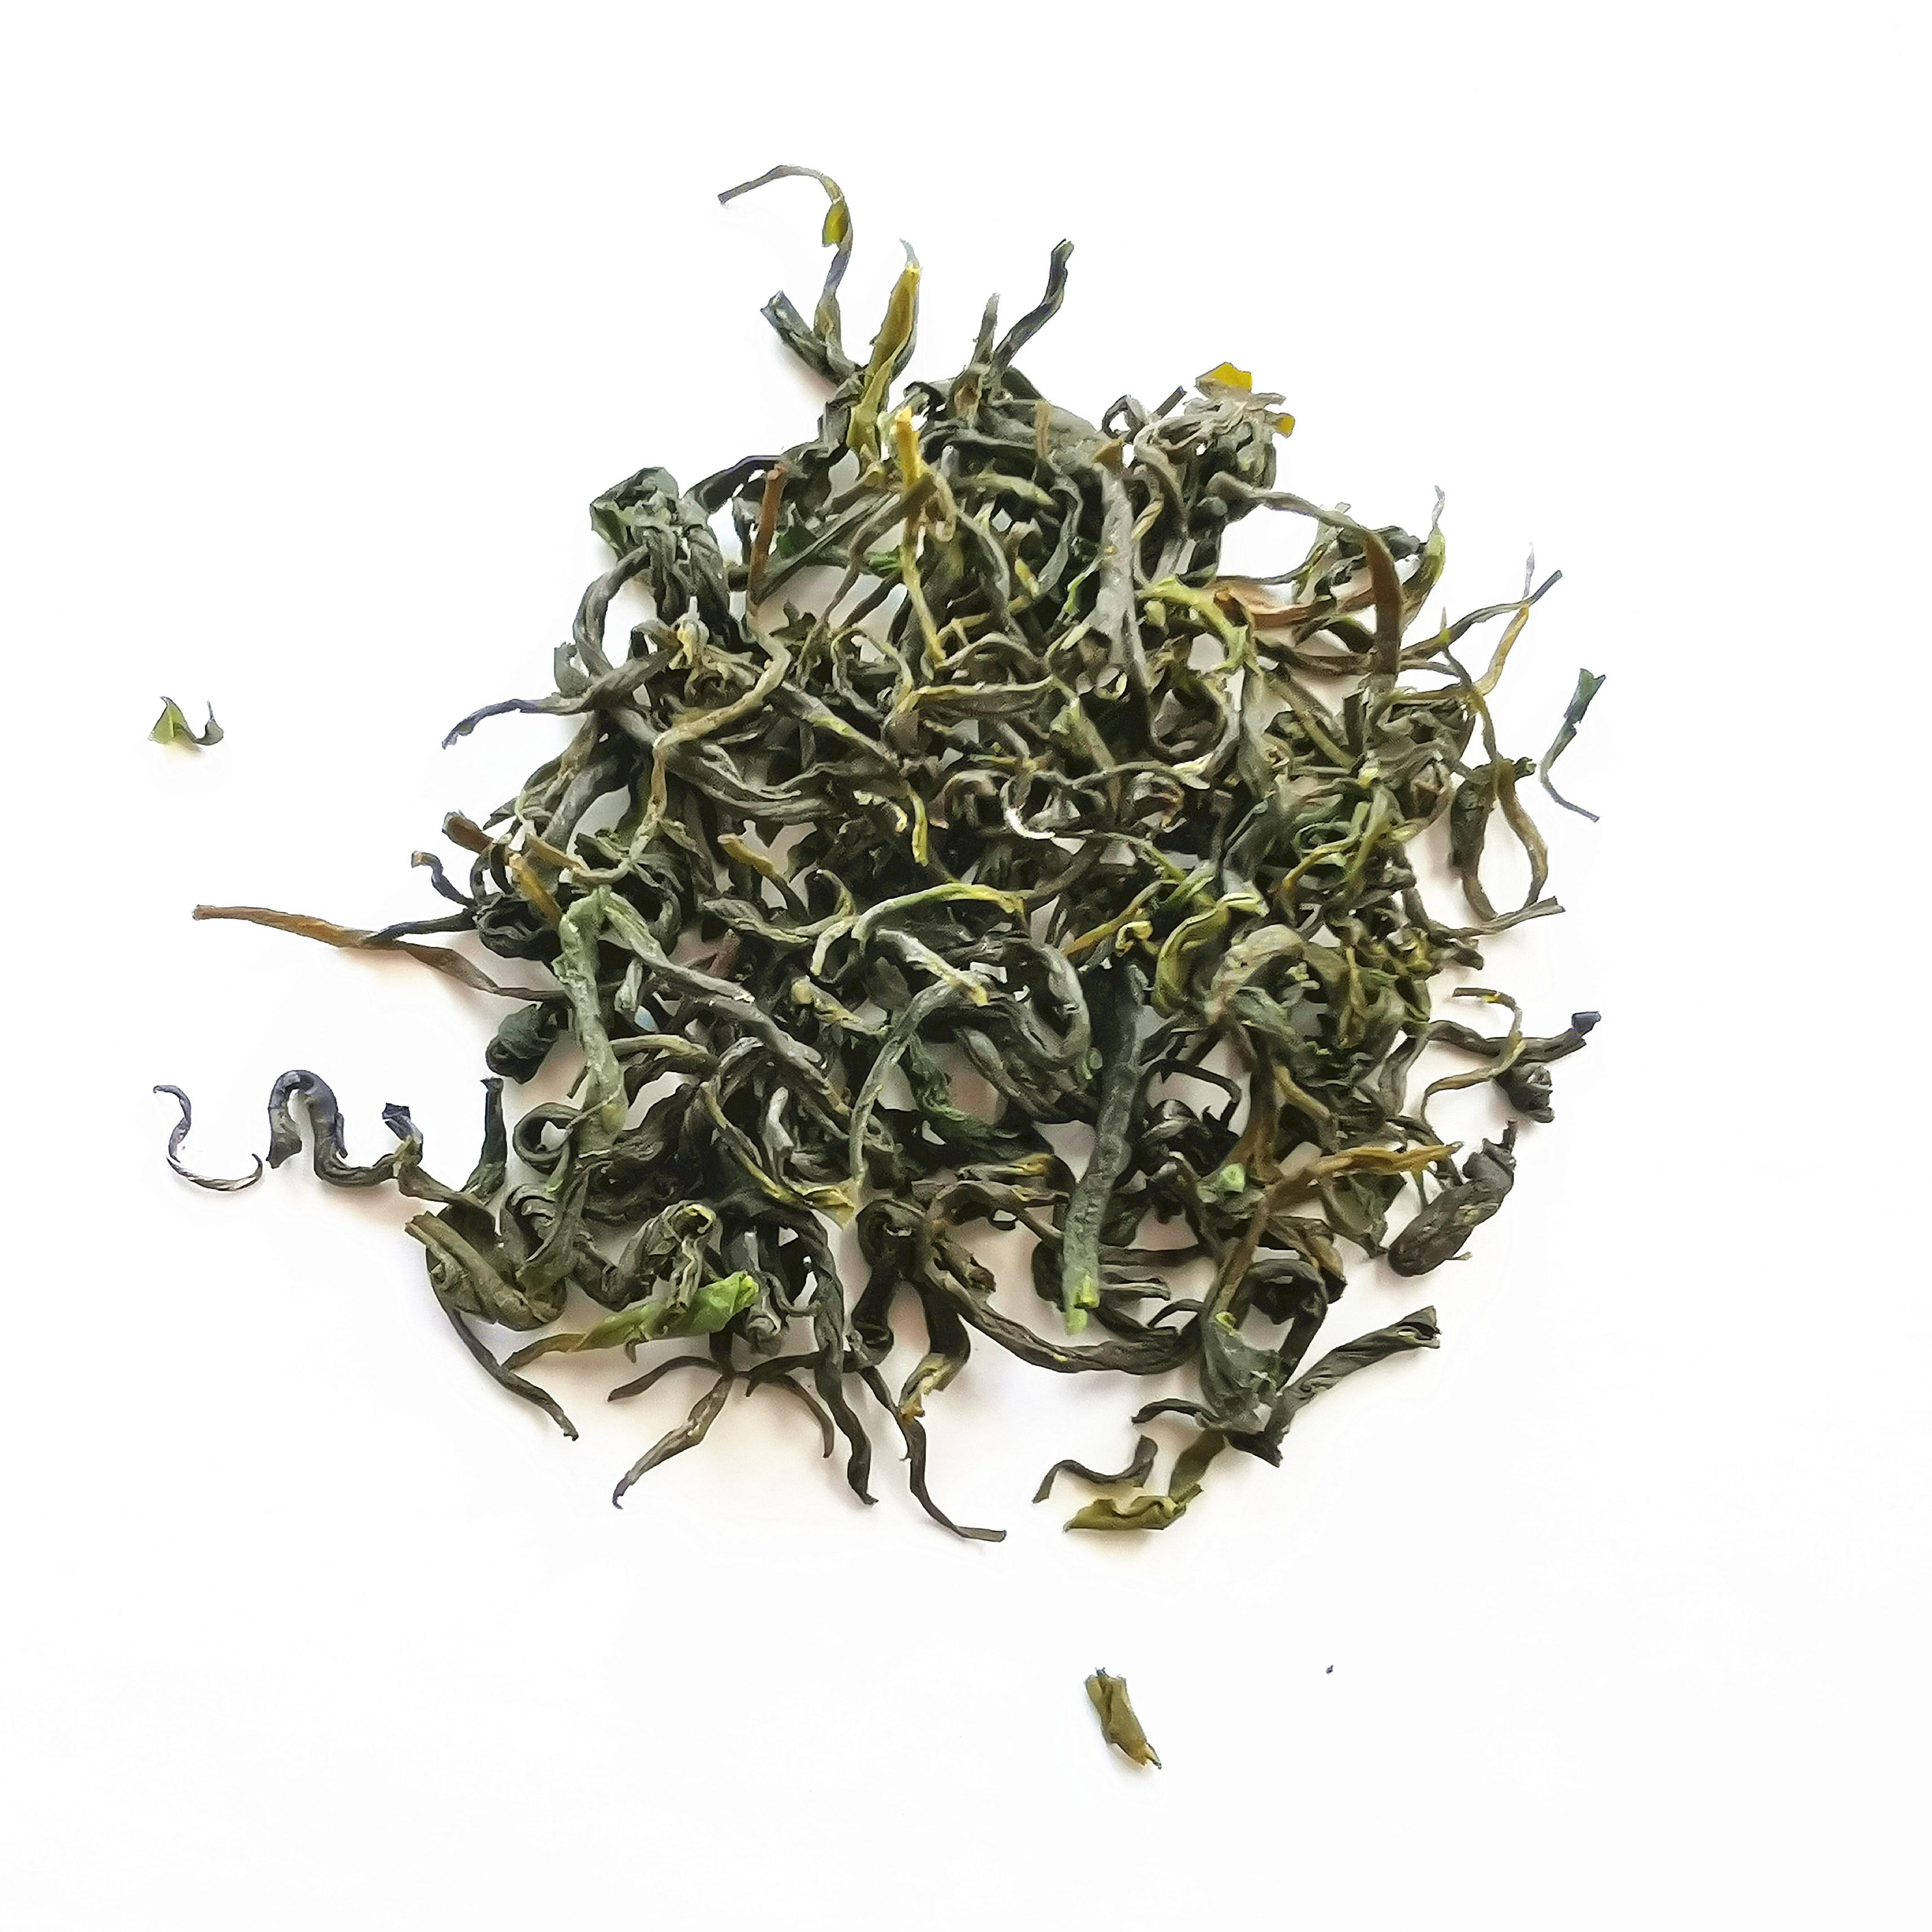 Online tea shopping new tea flavors organic tea green - 4uTea | 4uTea.com